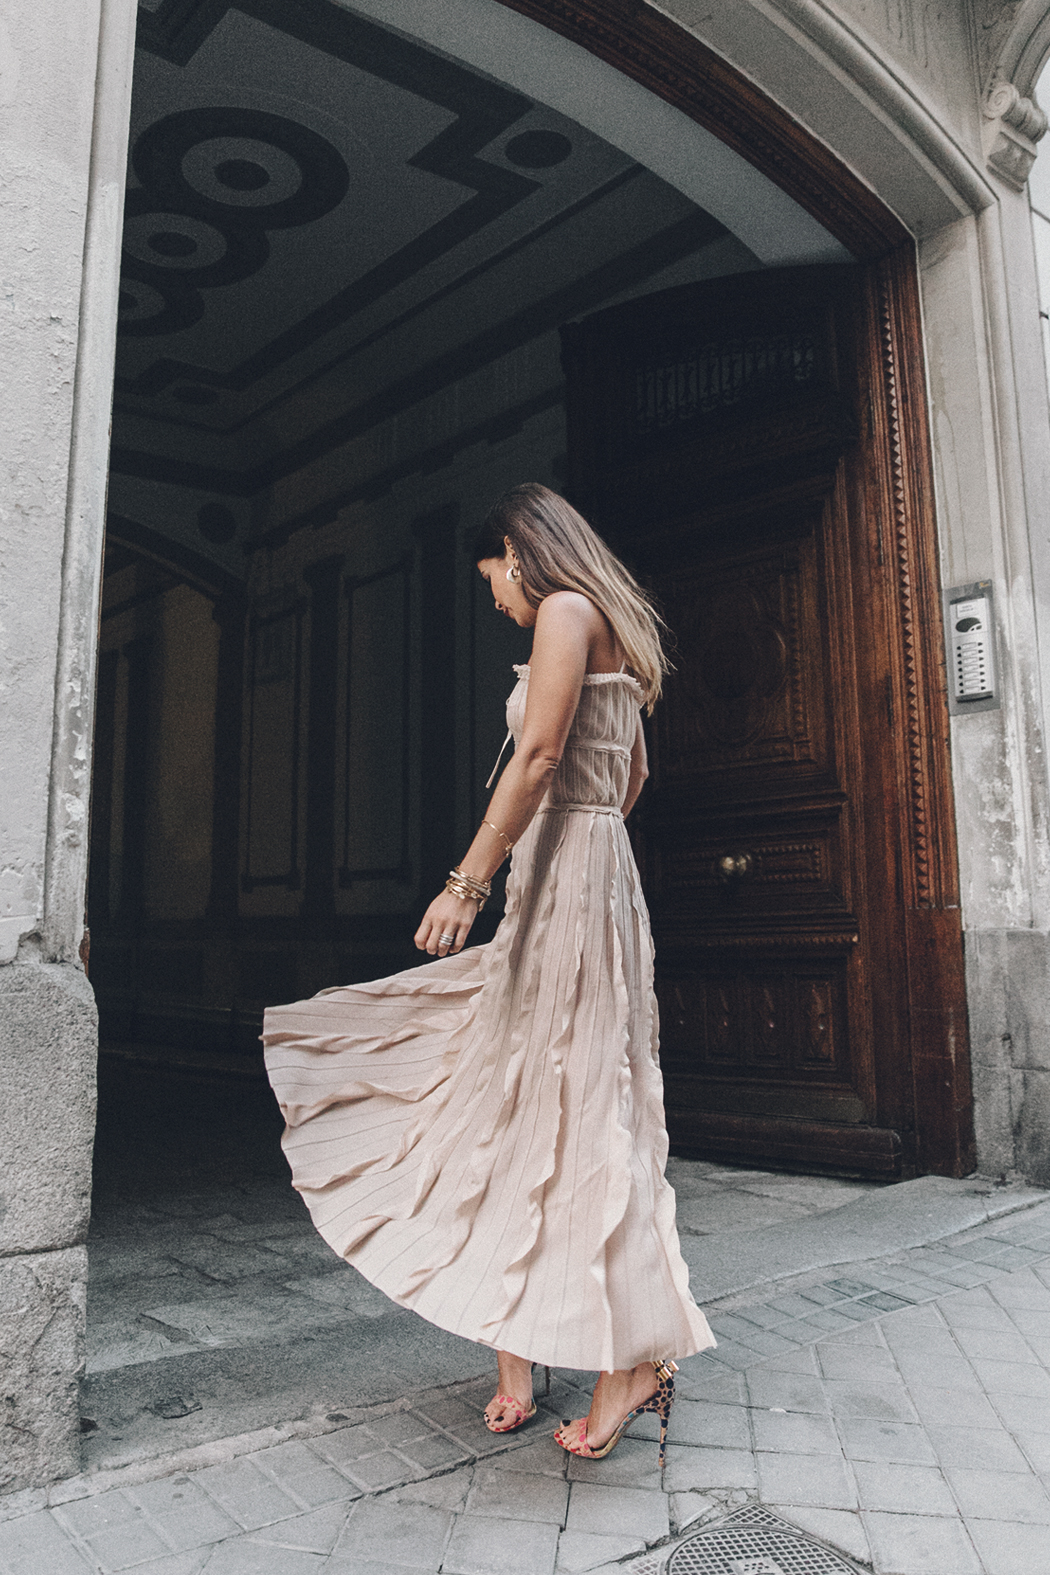 Salvatore_Ferragamo-Edgardo_Osorio_for_Ferragamo_Shoes_Collection-Nude_Dress-Dot_Sandals-Outfit-Collage_Vintage-